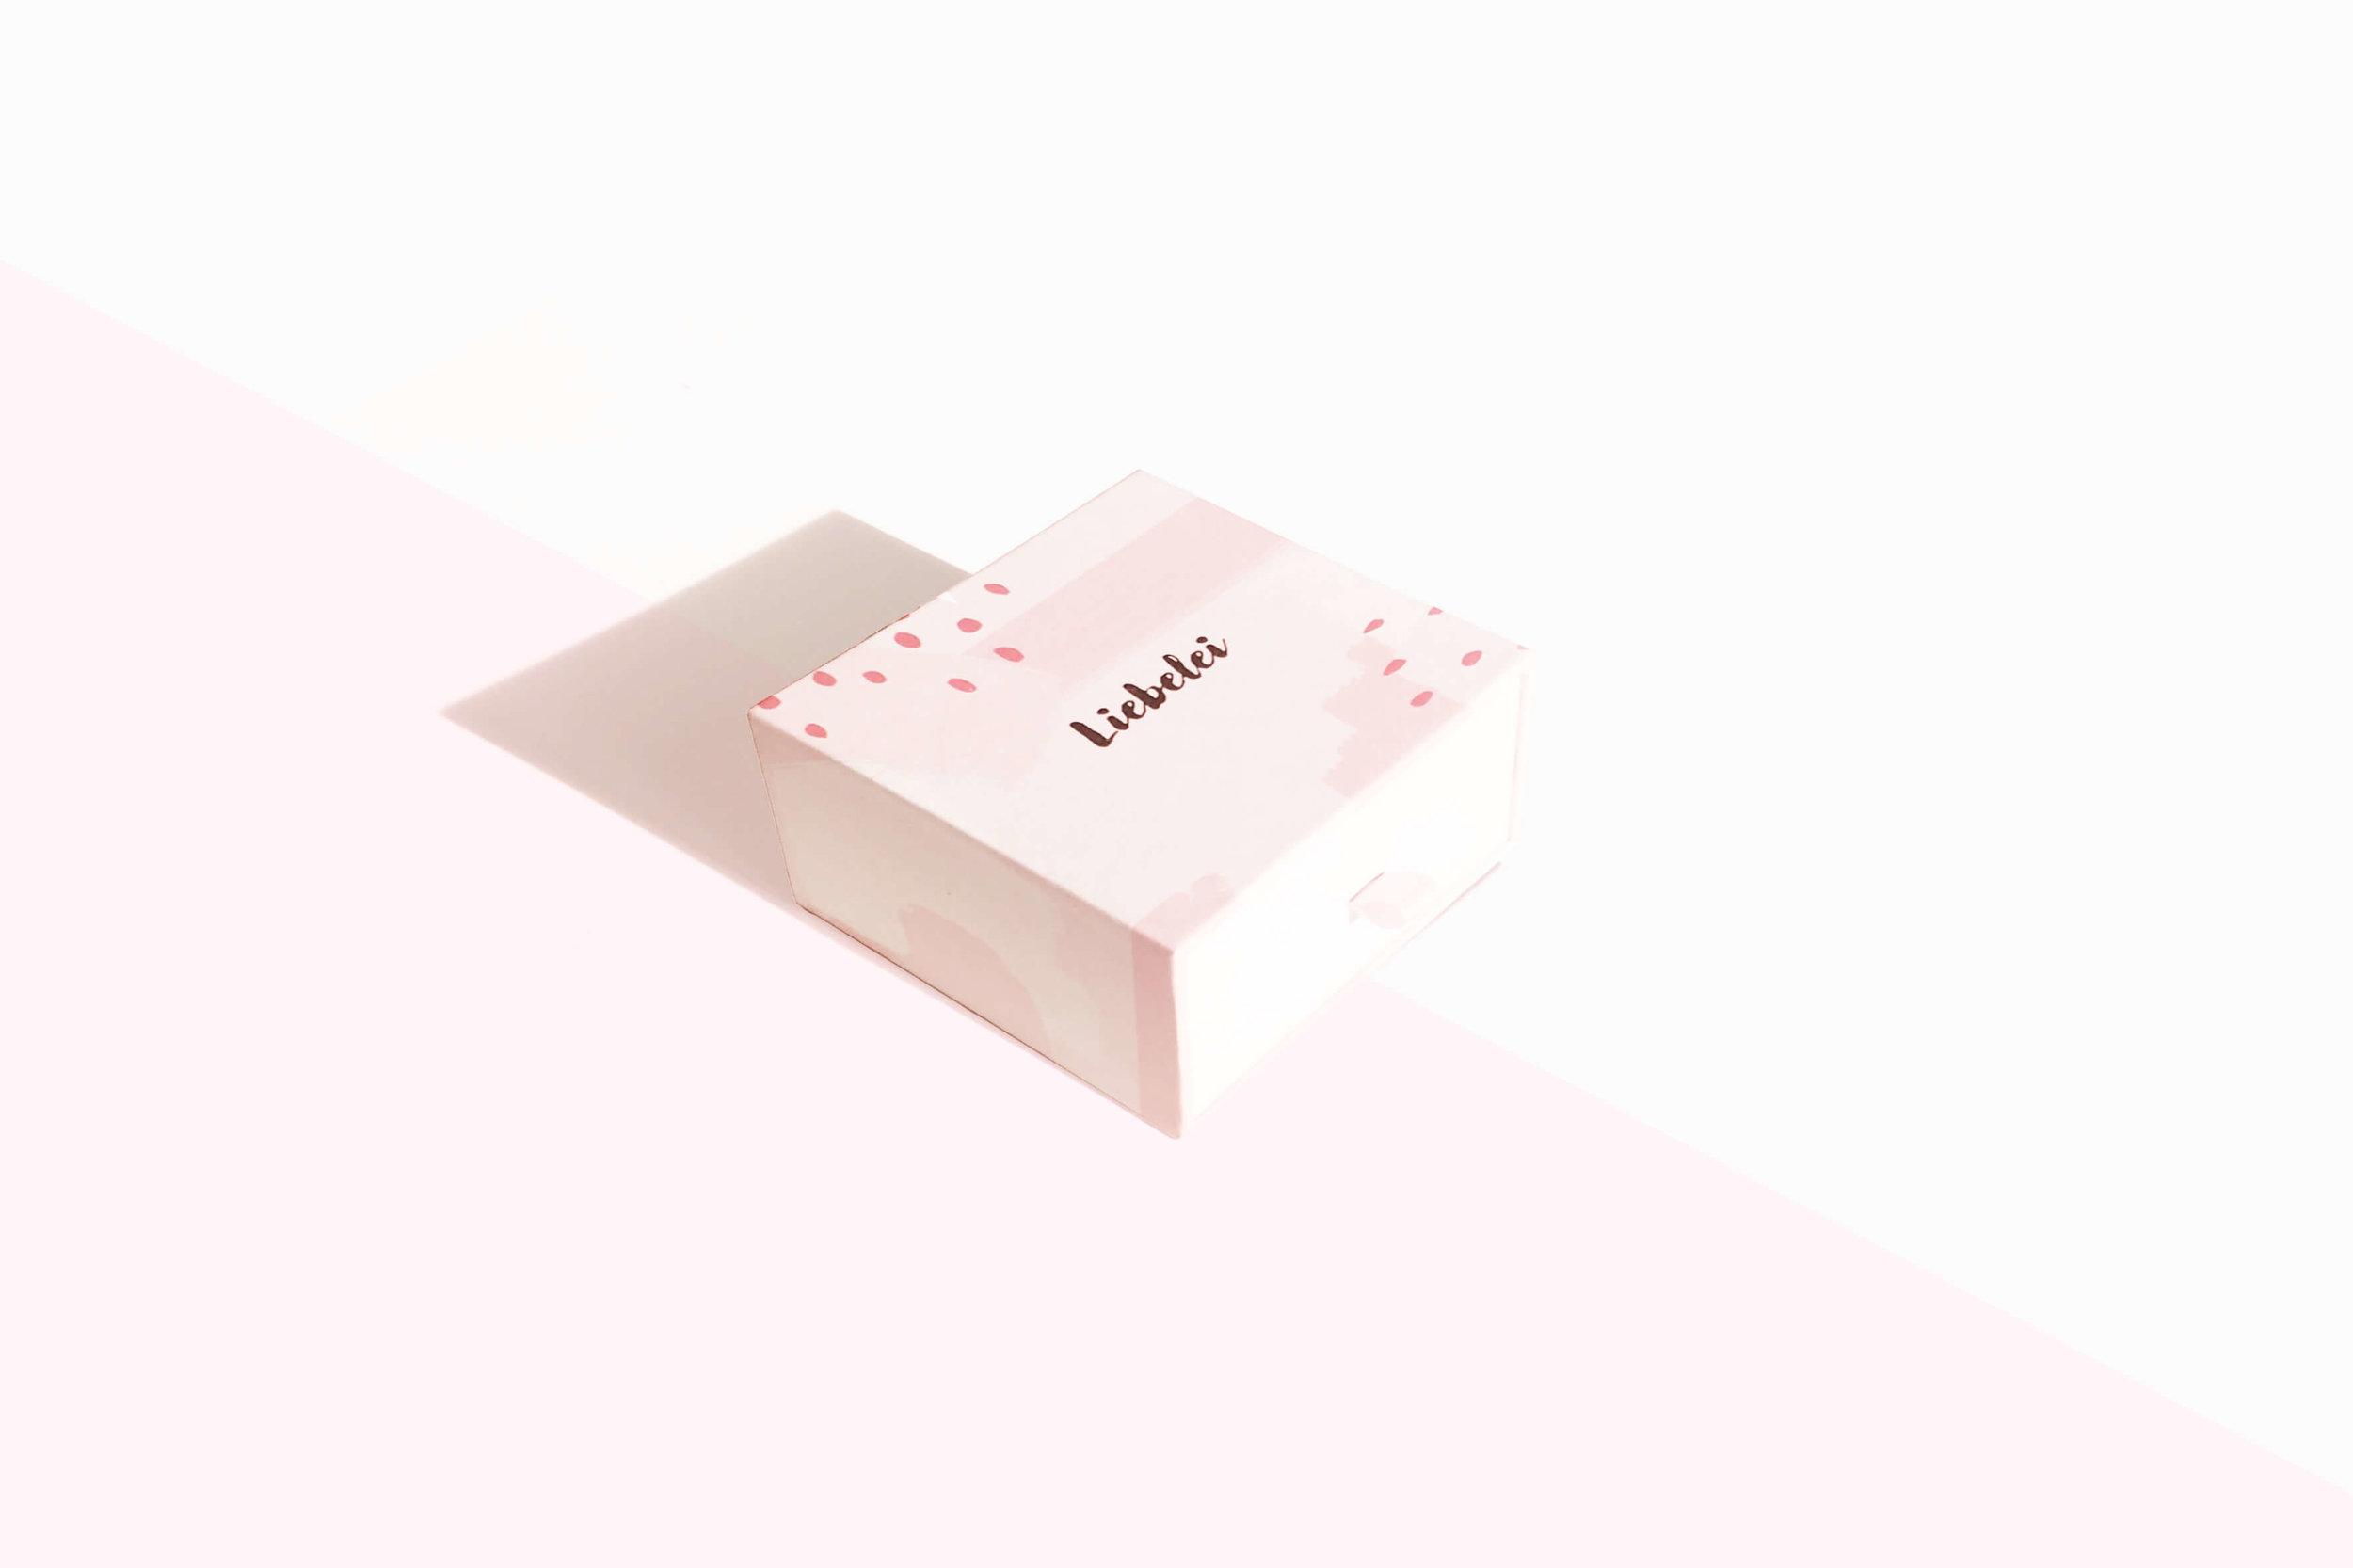 liebelei-lynea-yoni-ei-set-packaging.jpg